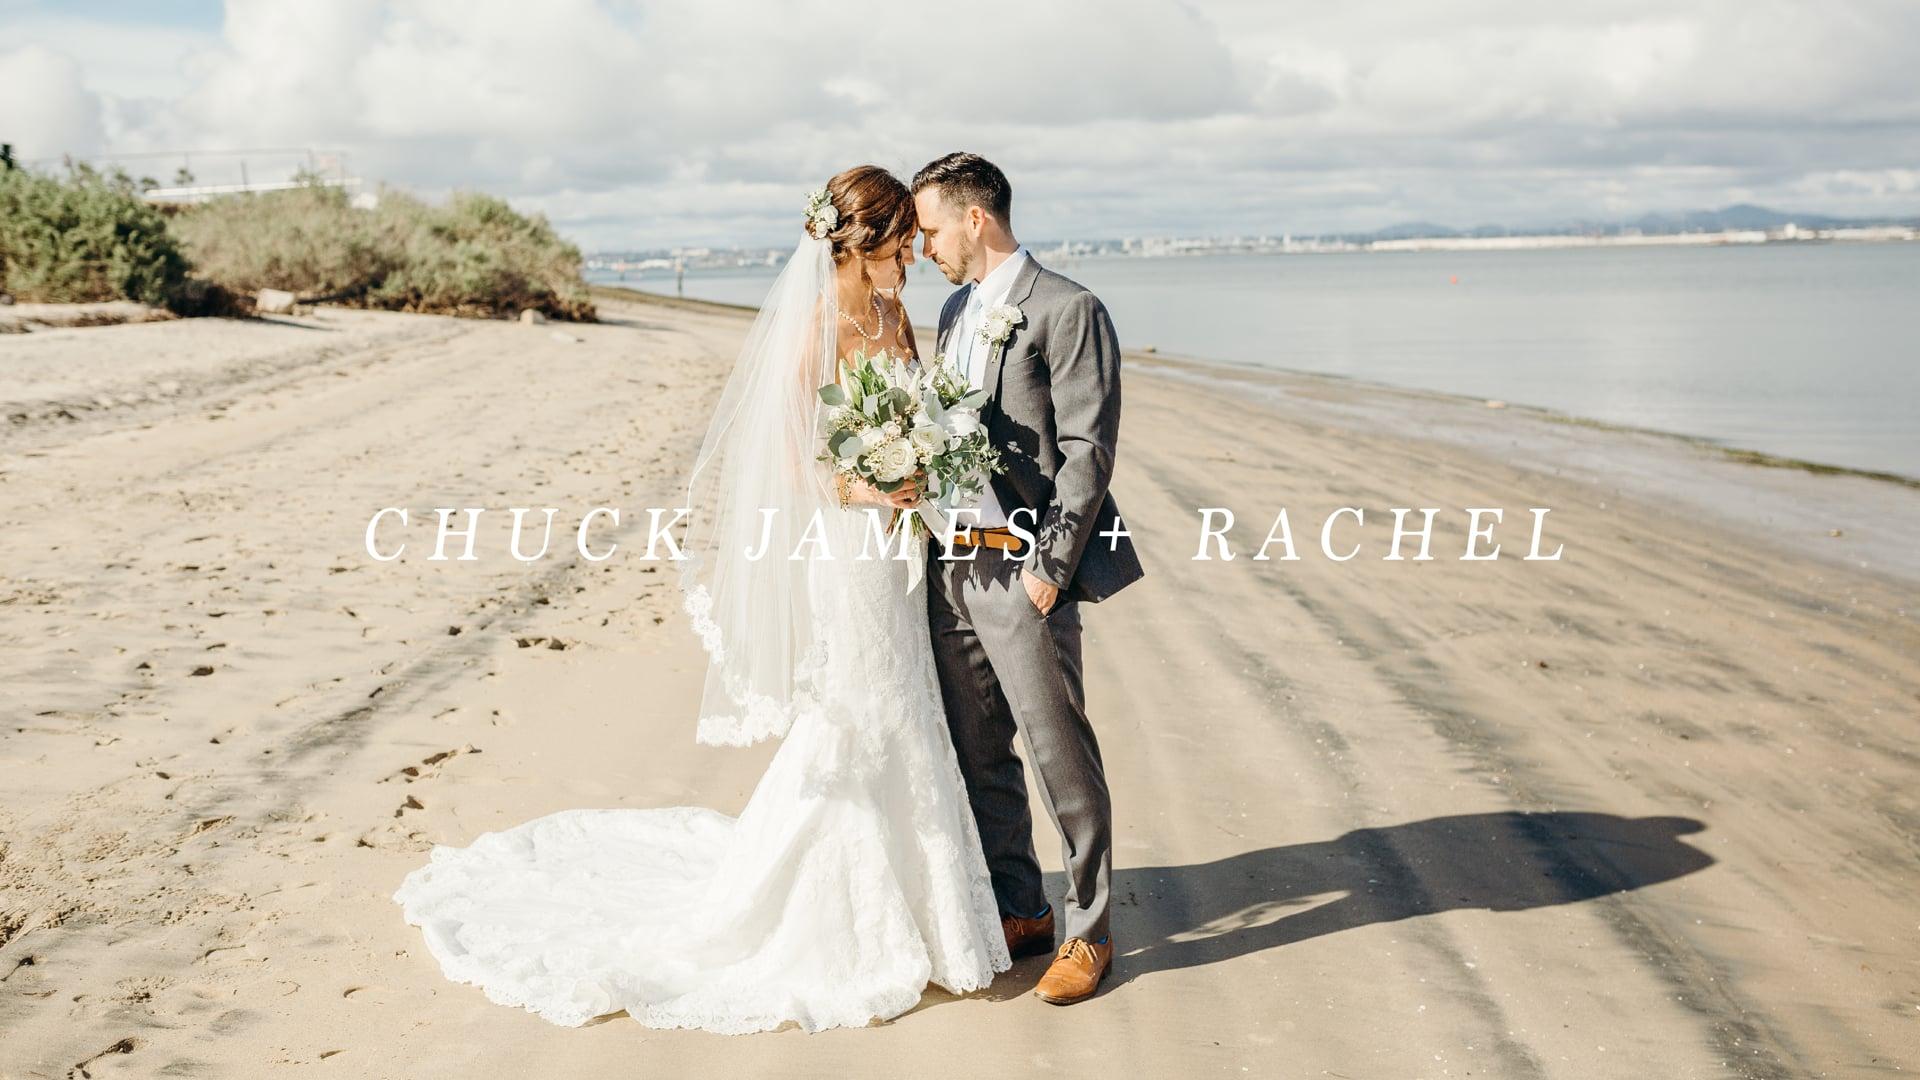 Chuck James + Rachel